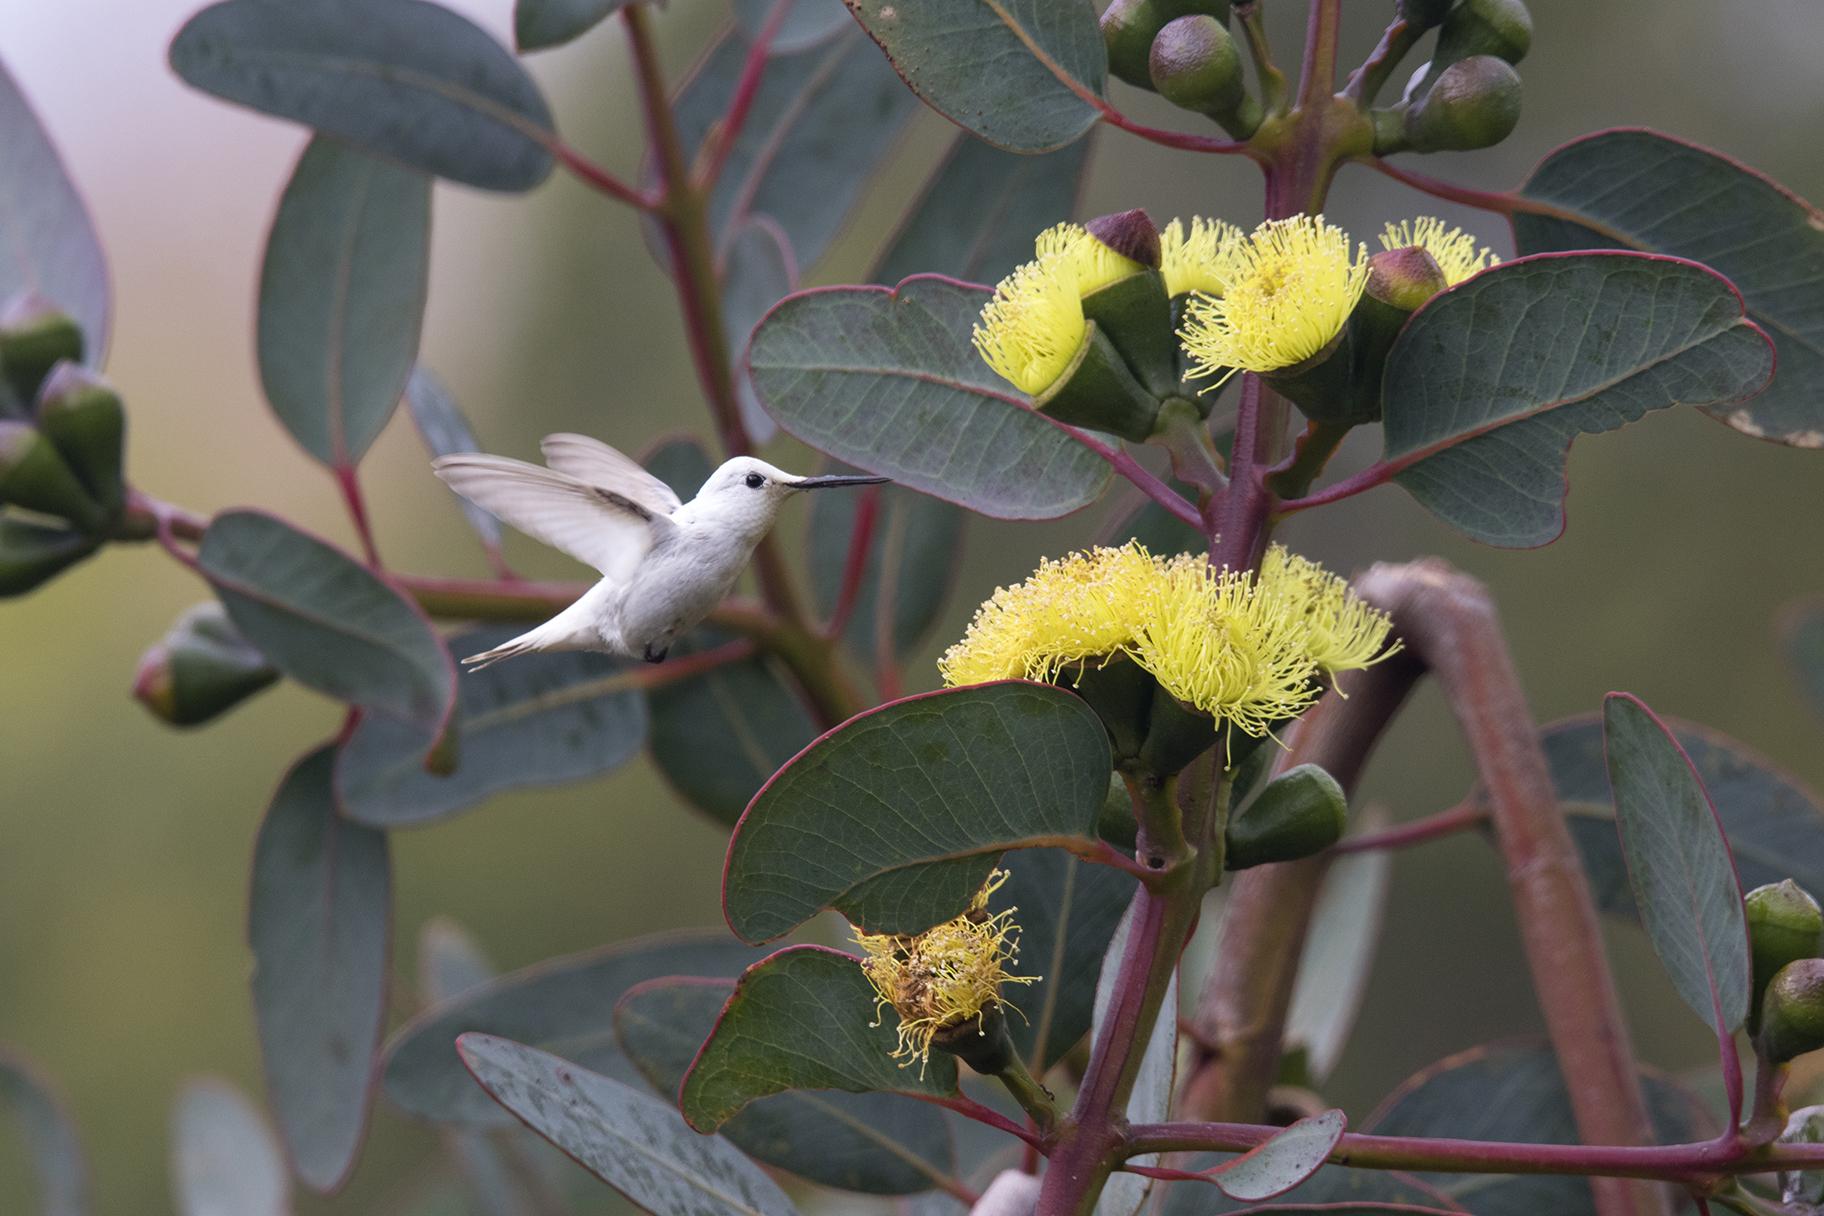 17-15 Leucism Hummingbird